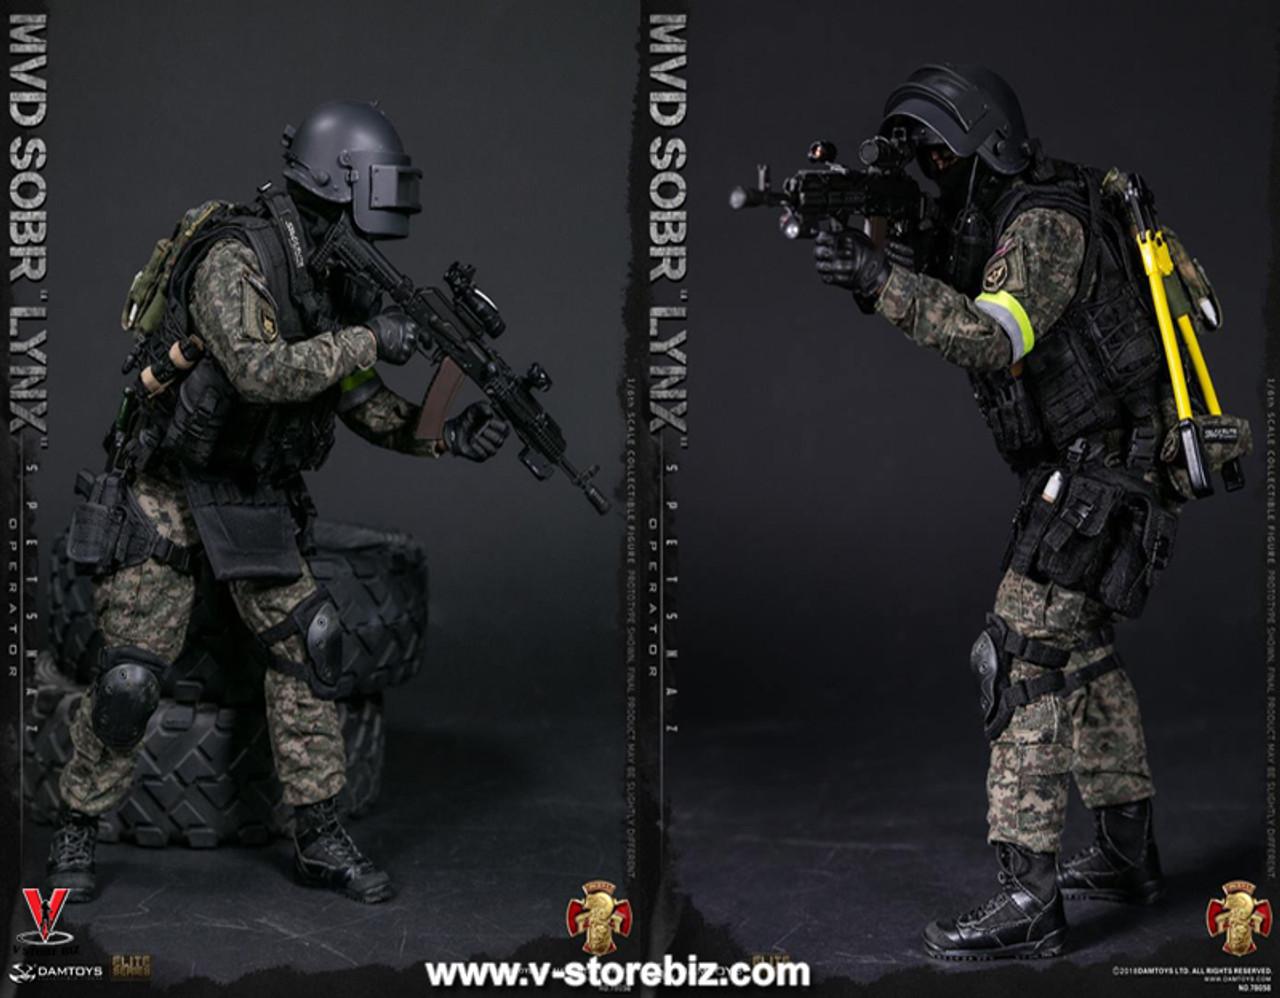 Grip for DAM 78059 RUSSIAN SPETSNAZ MVD 2.0 1//6 Scale Action Figure